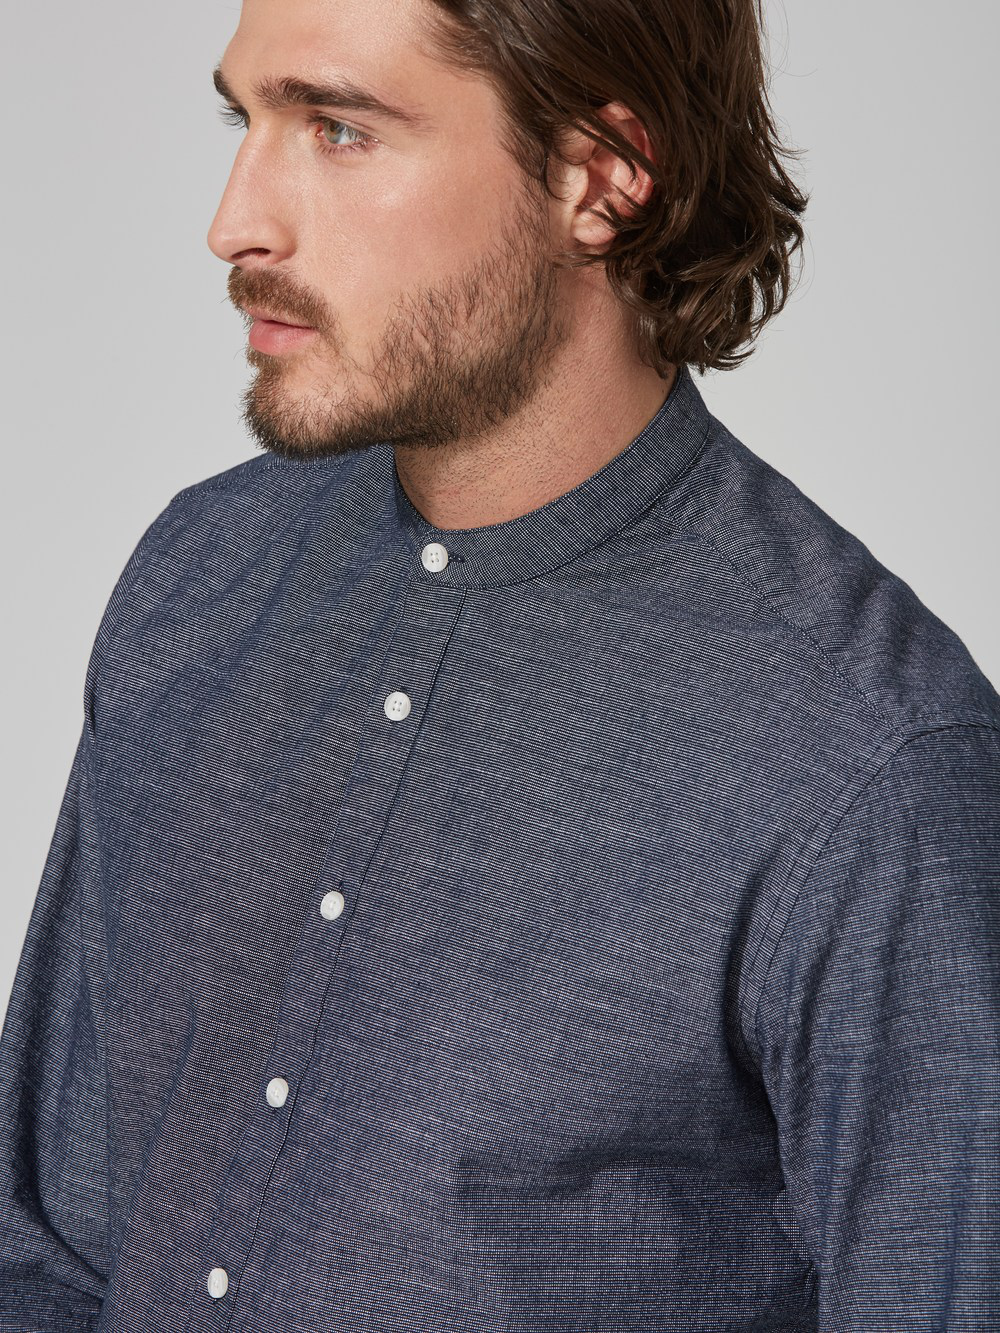 Frank + Oak Slub-cotton Band Collar Shirt In Navy